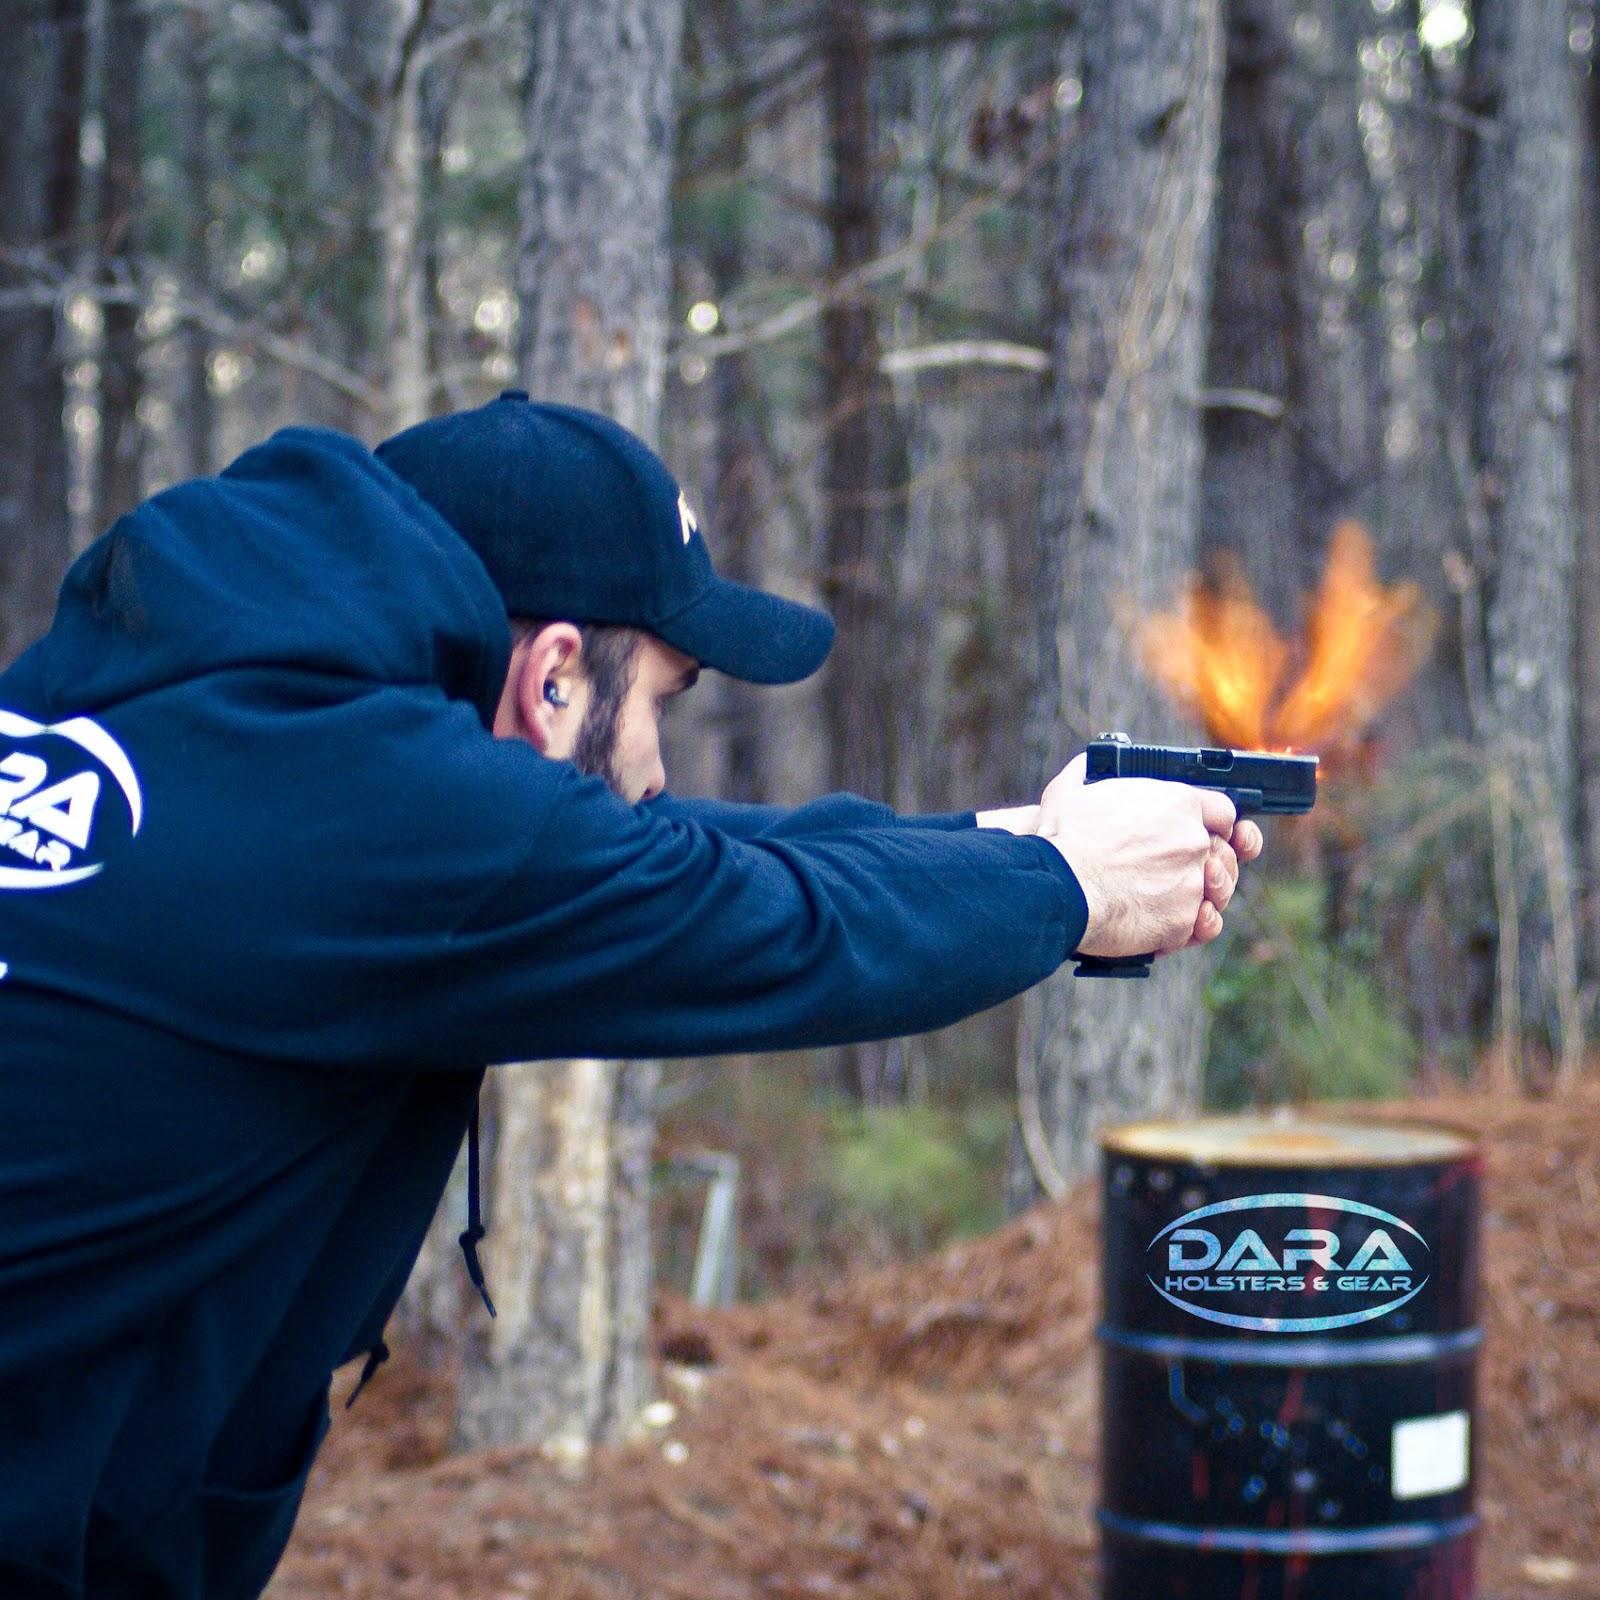 Glock 17 Fireball - Dara Custom Holsters